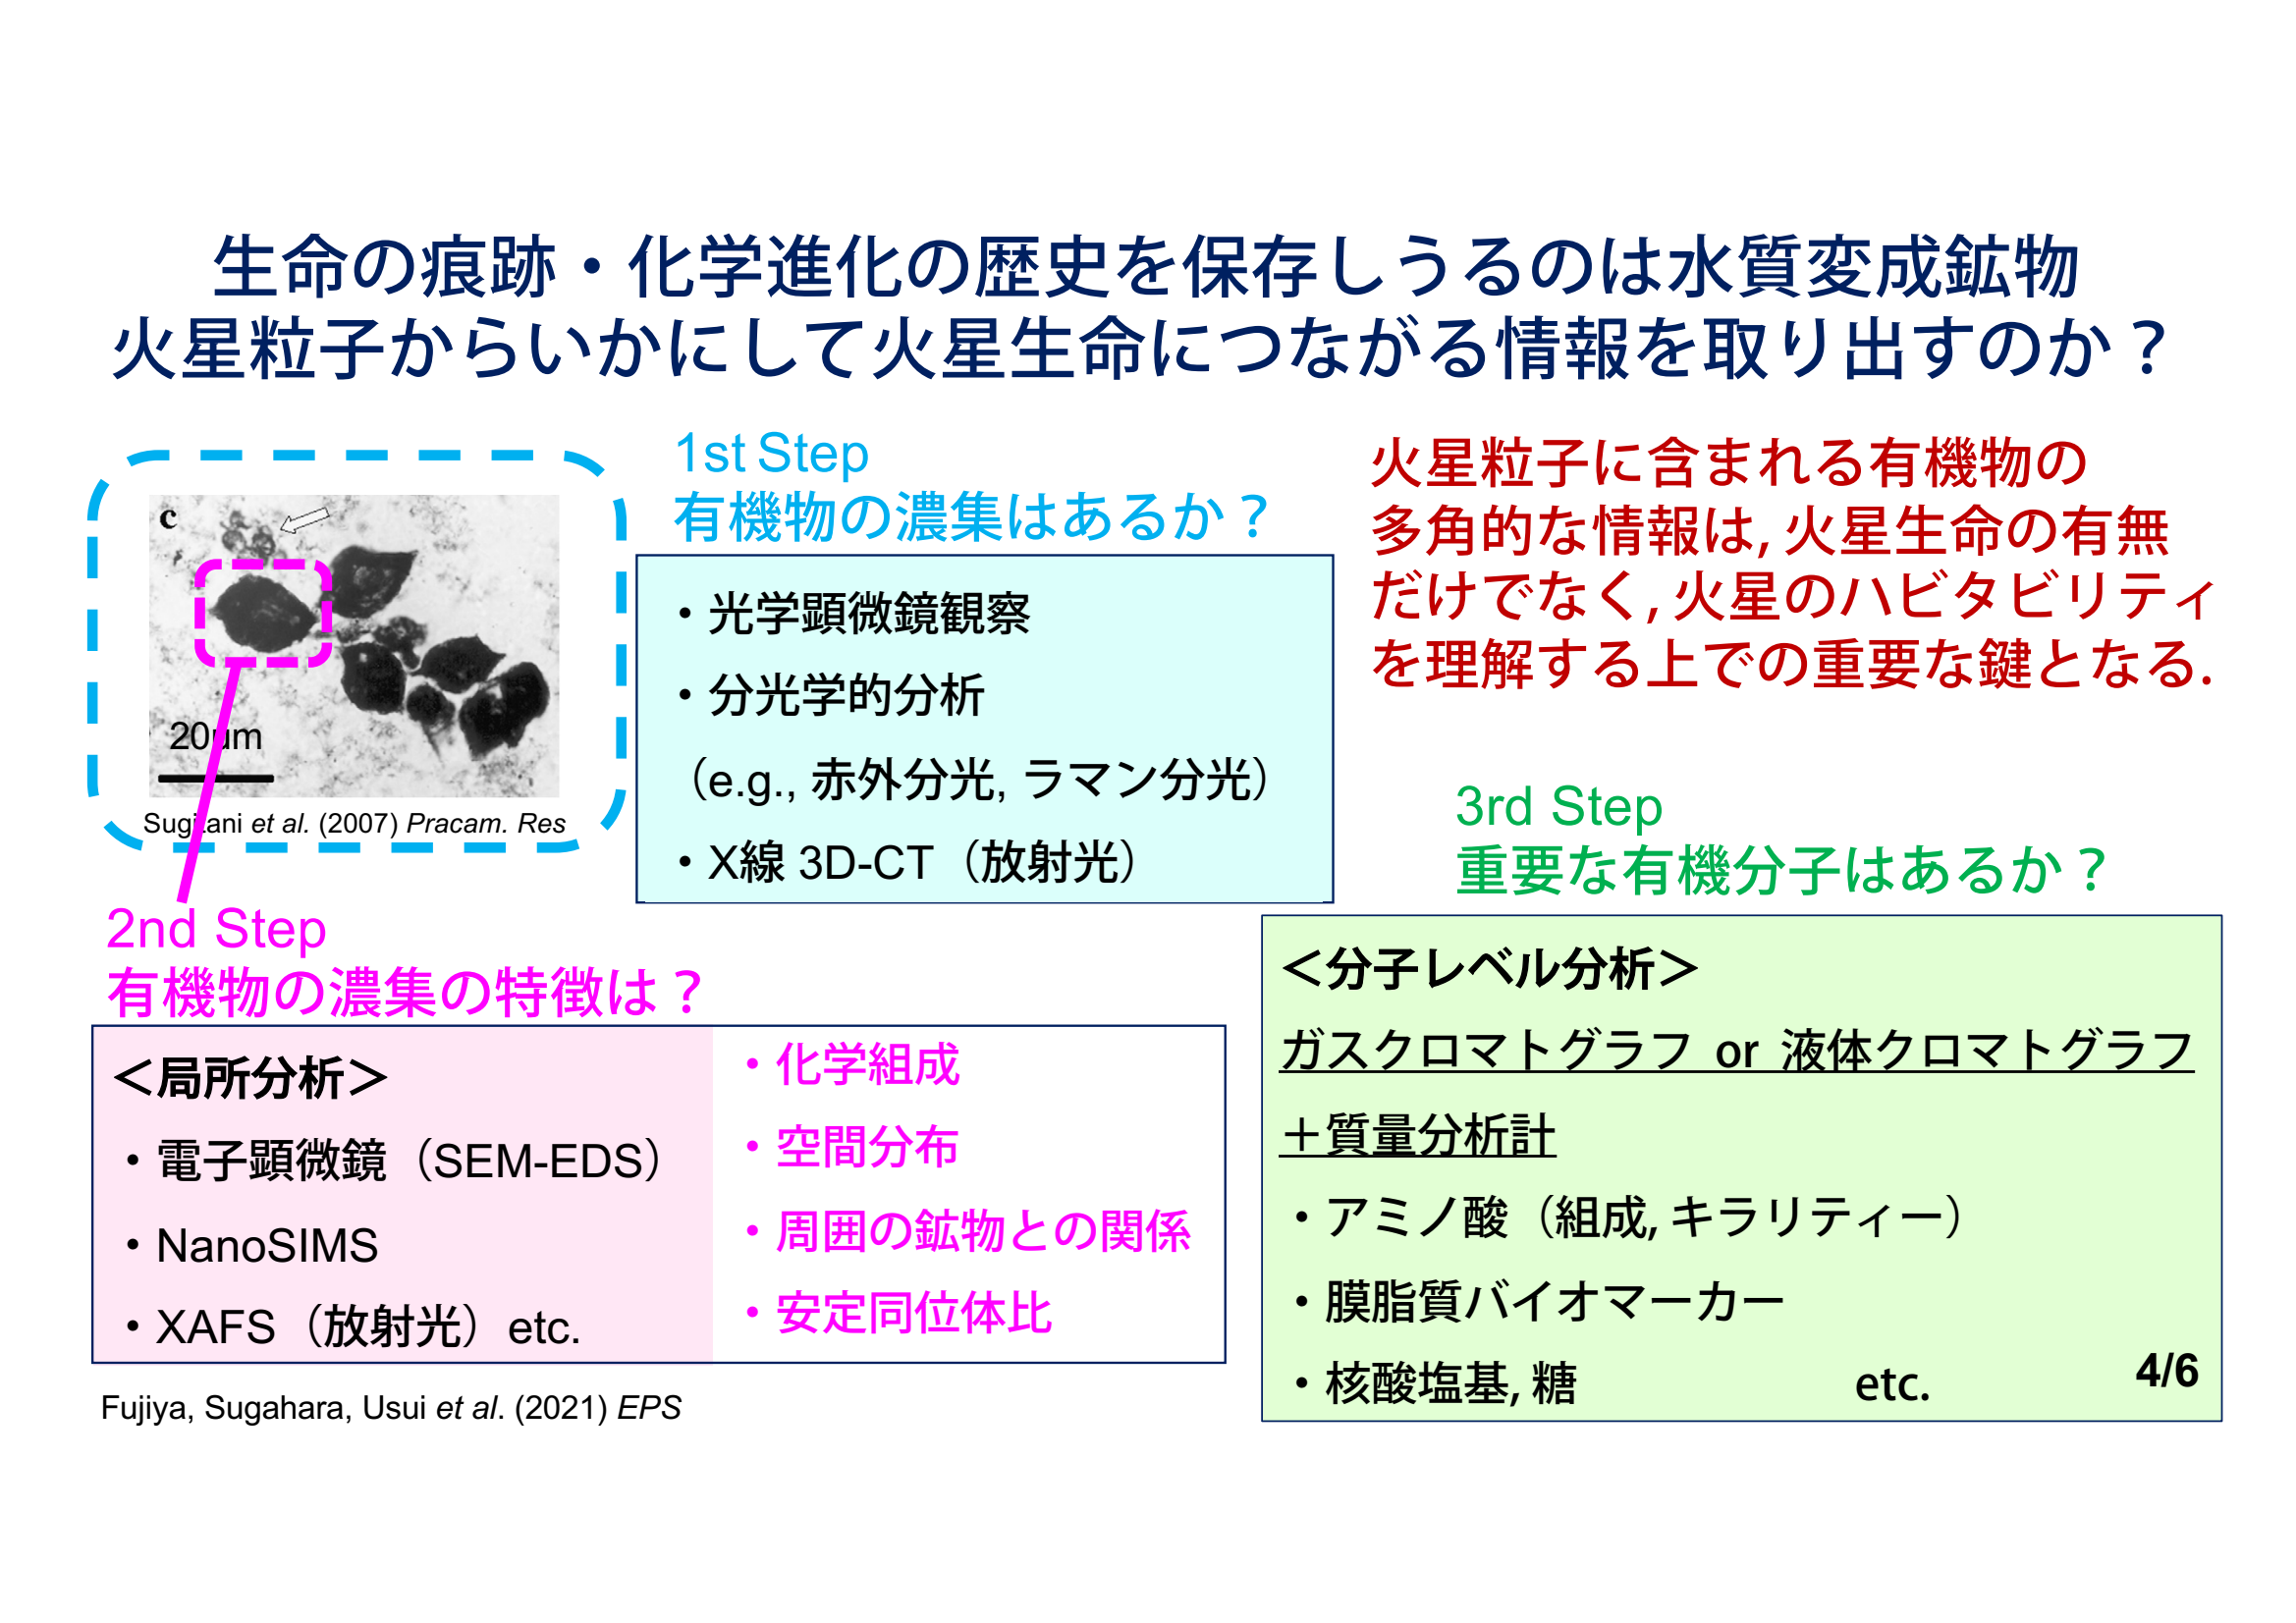 f:id:Imamura:20210819095615p:plain